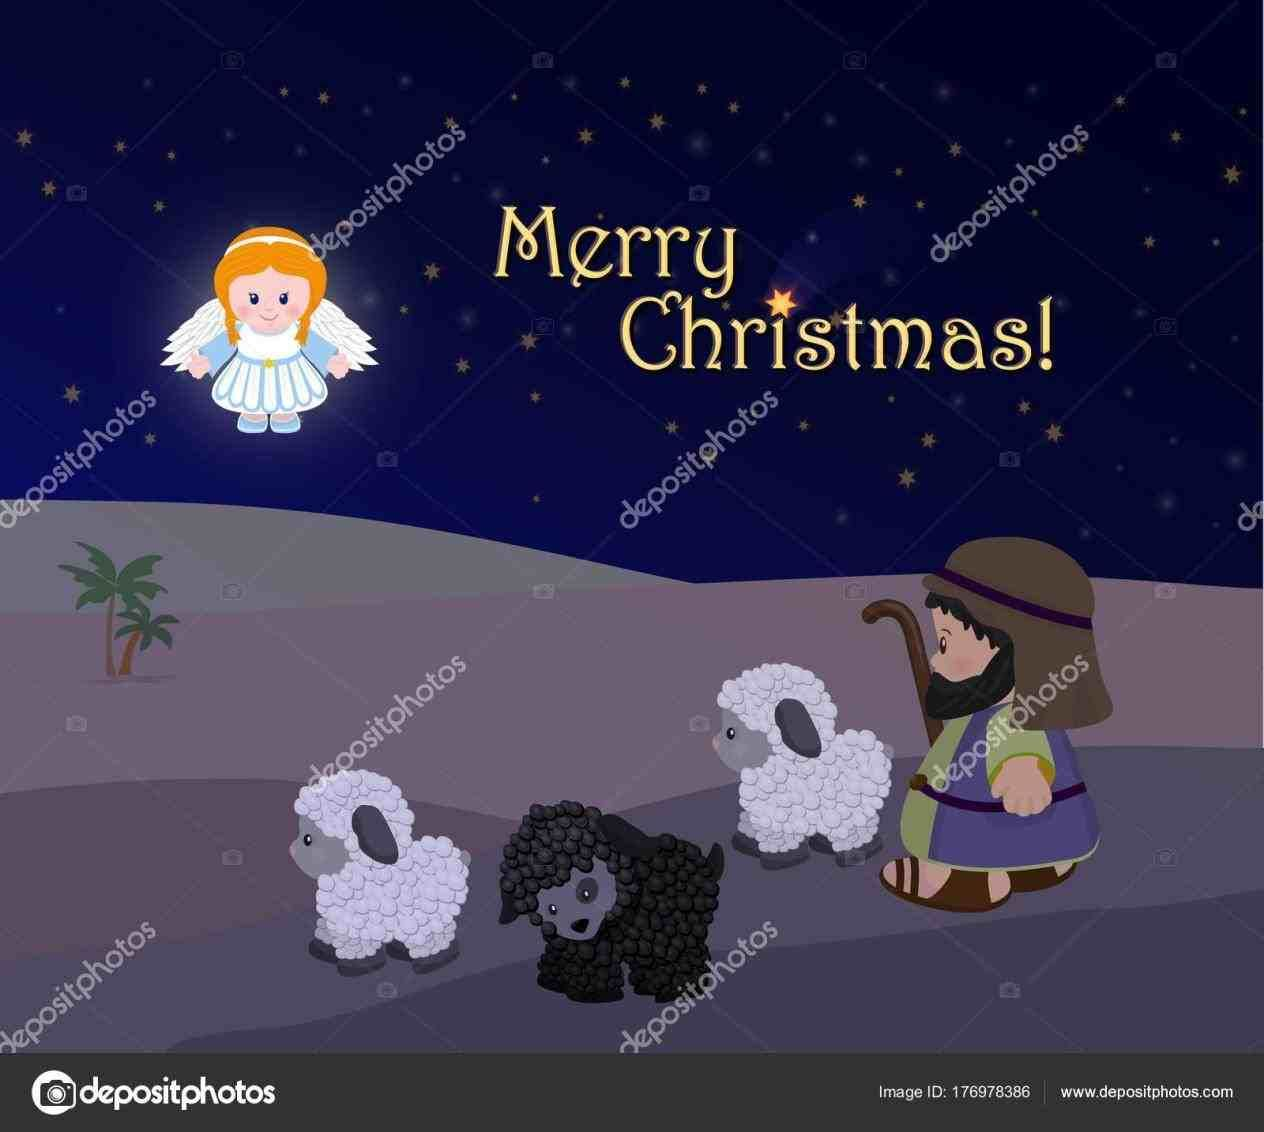 New post merry christmas manger interesting visit xmast